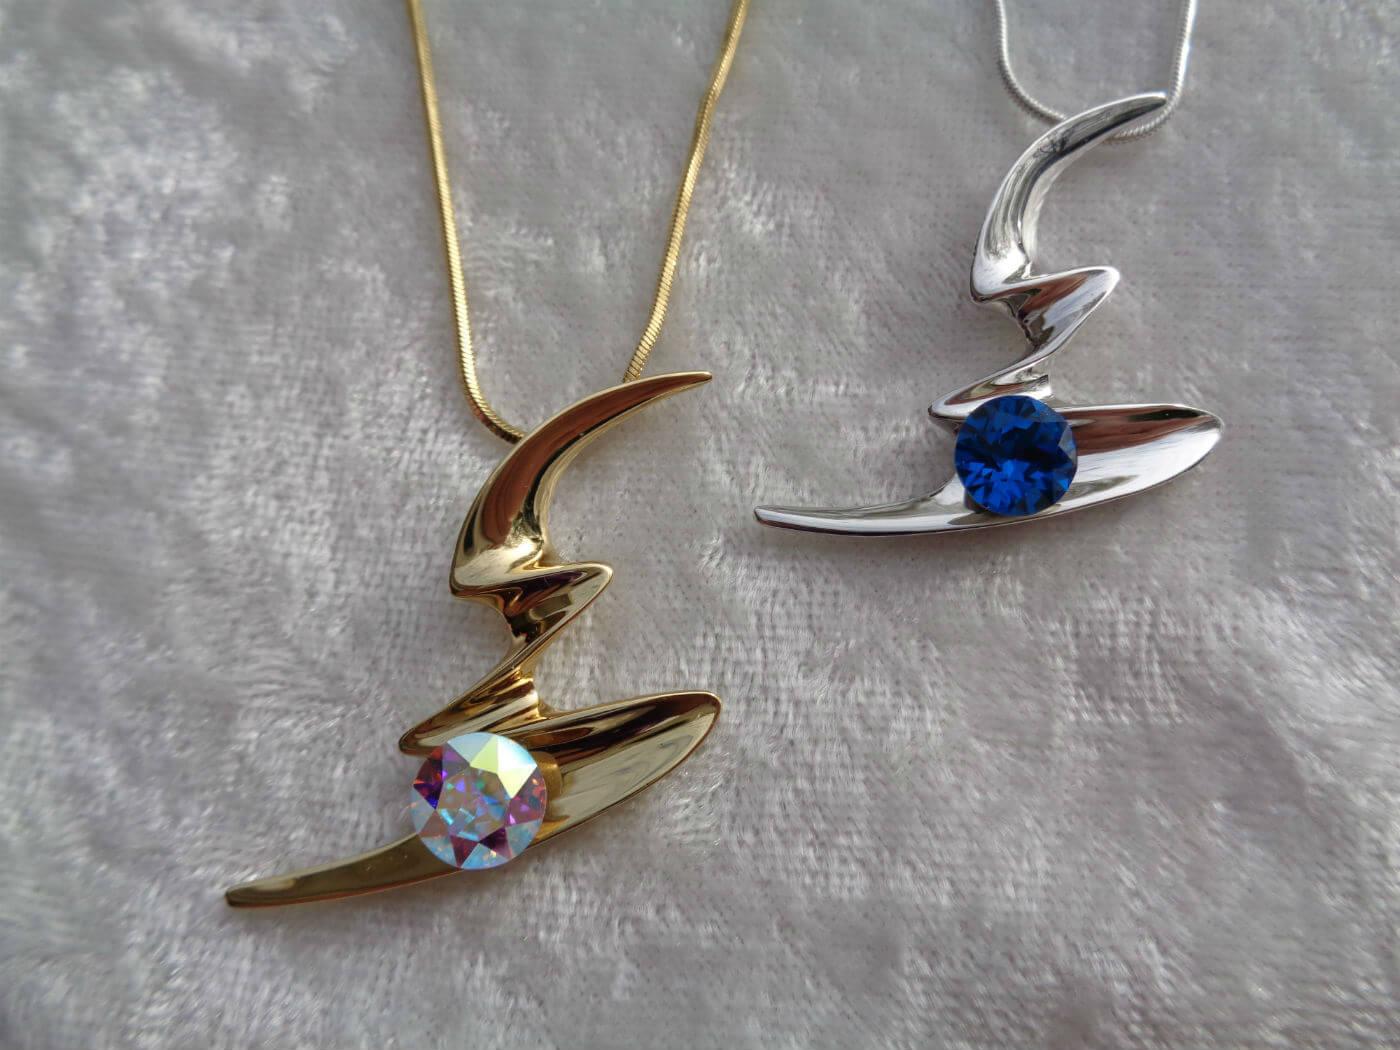 Interchangeable Pendants: Cecil Kisiel, Get Personal Designer Jewelry, handmade statement jewelry, designer jewelry